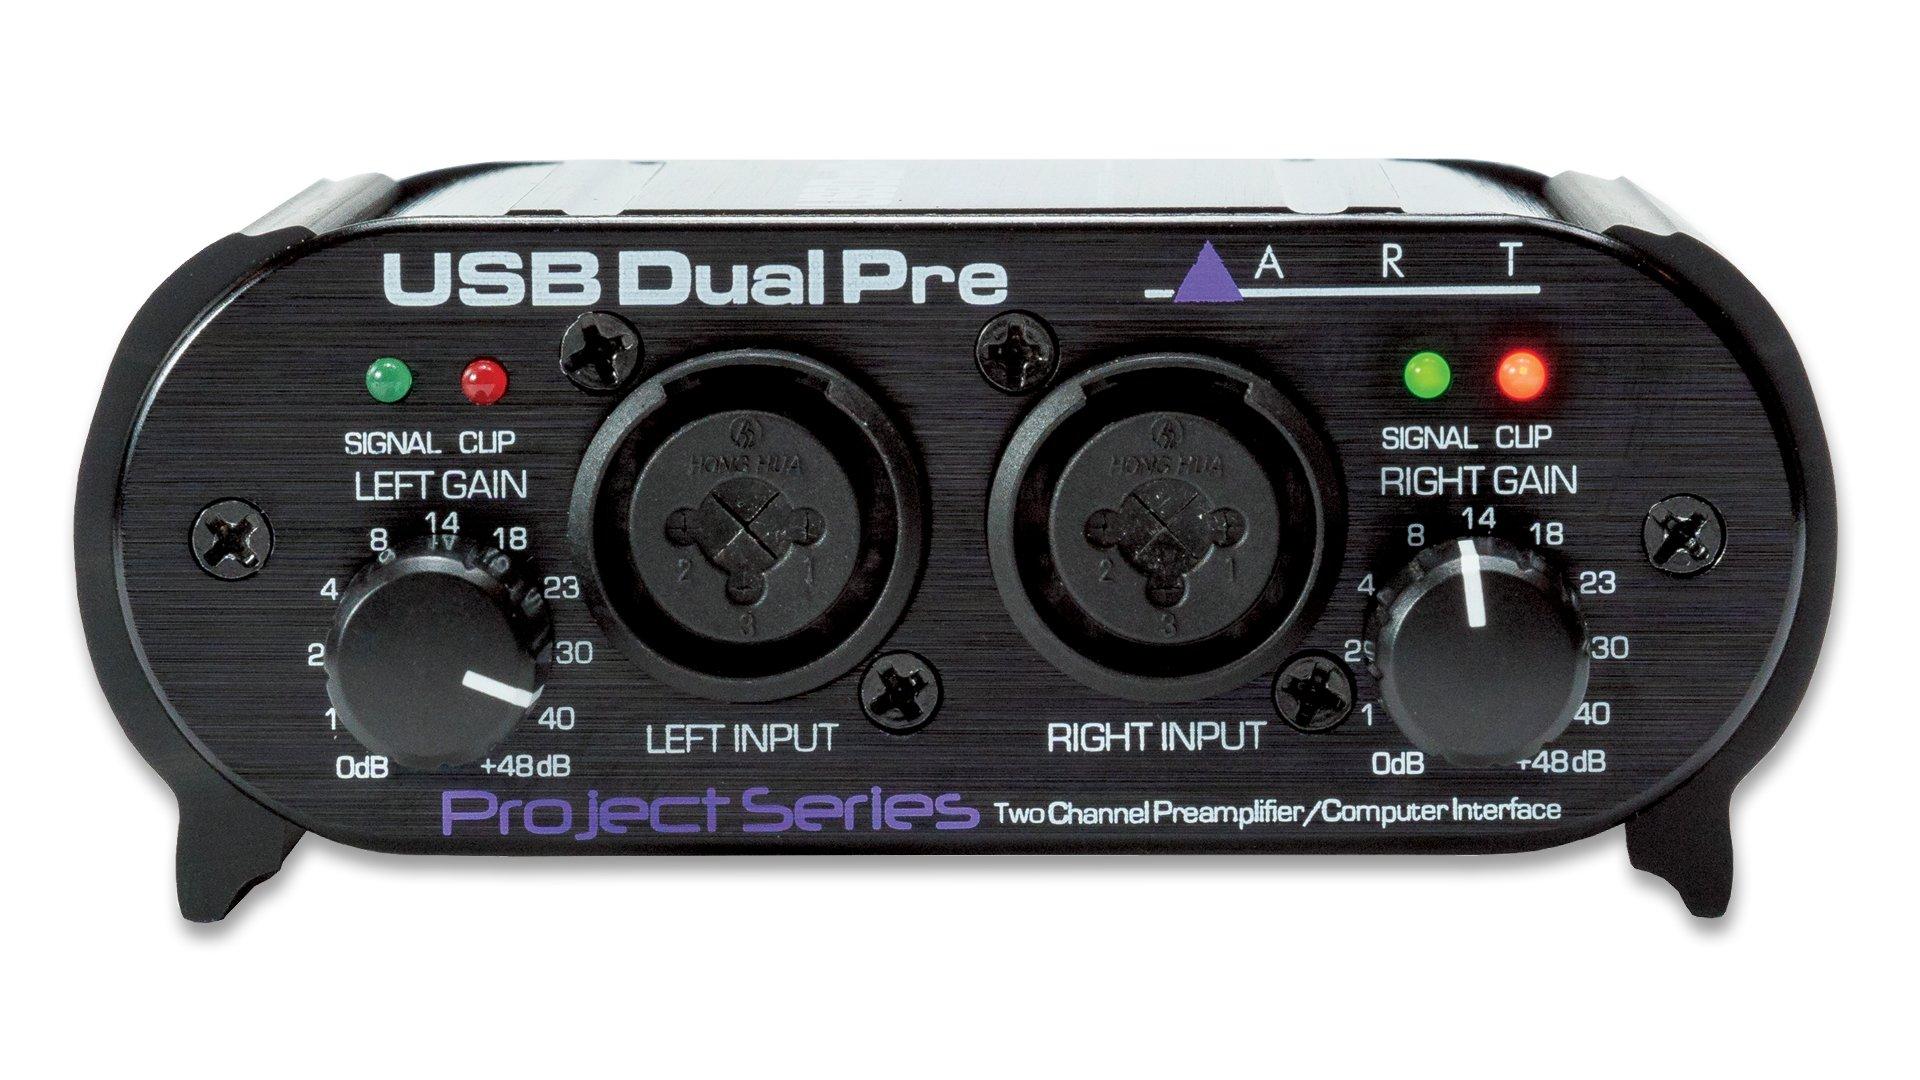 ART USBDUALPREPS Dual Preamp 2-Channel PreAmp/Computer Interface